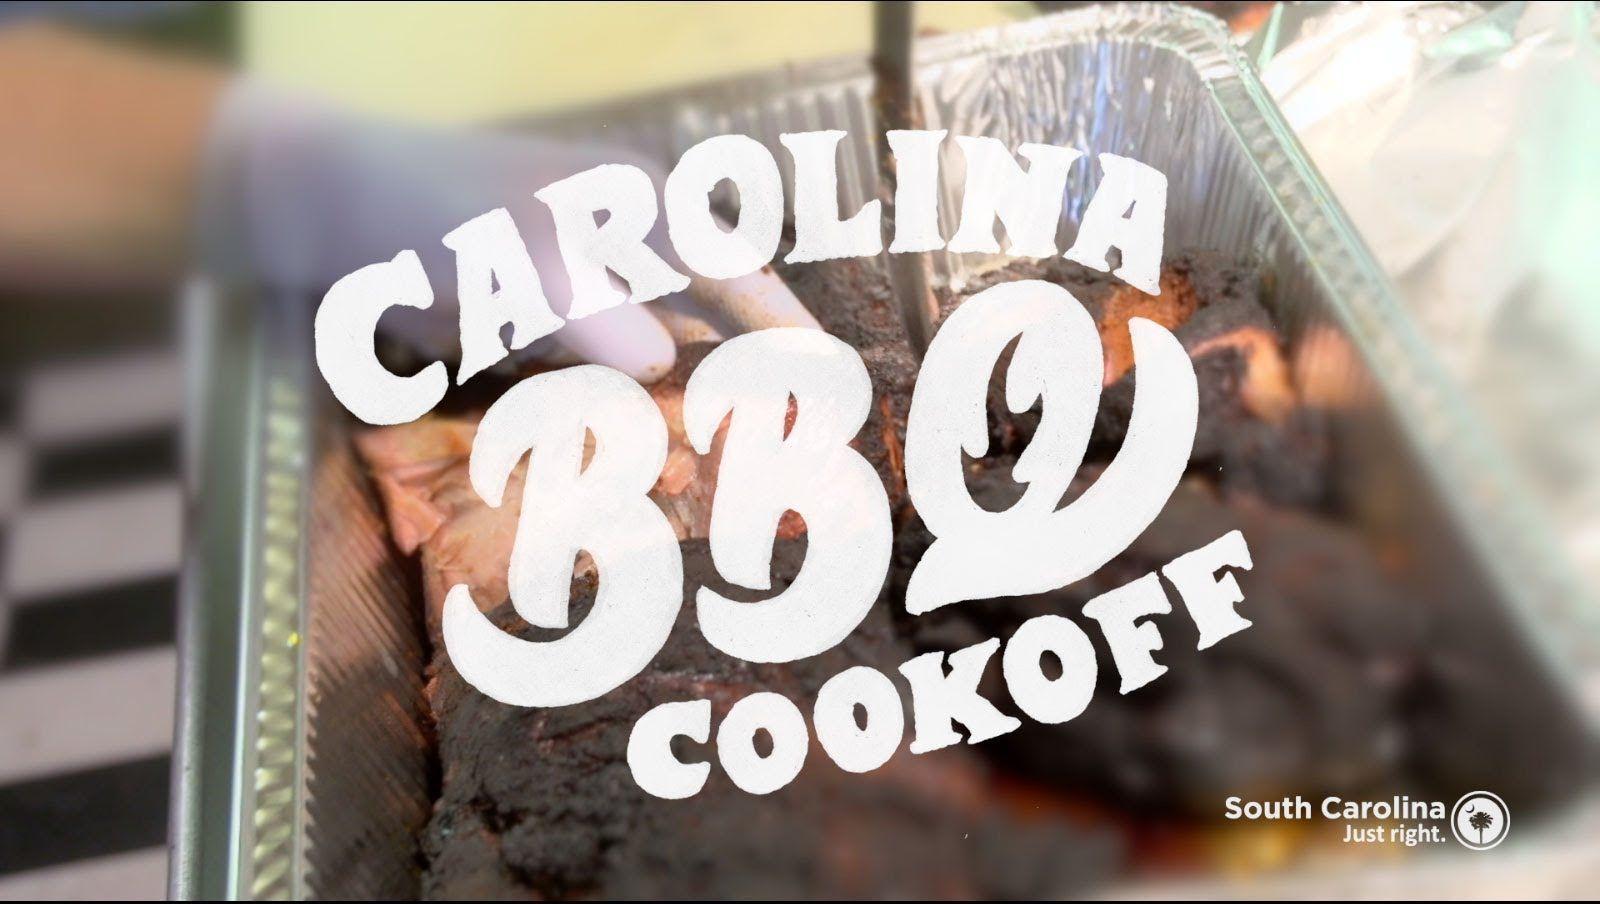 Carolina barbecue cookoff cook off south carolina